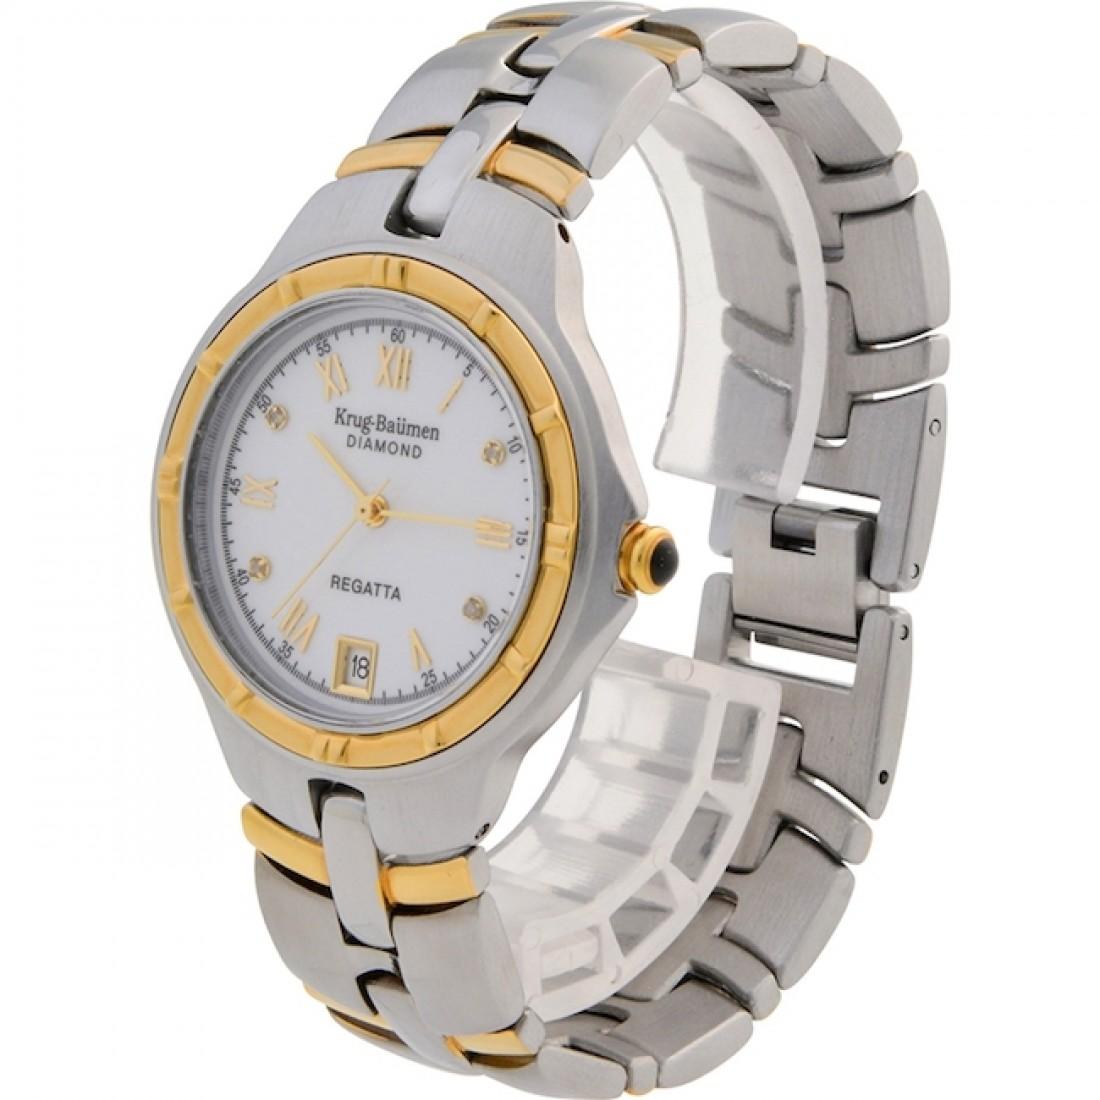 Men's Regatta Diamond Chronograph Watch